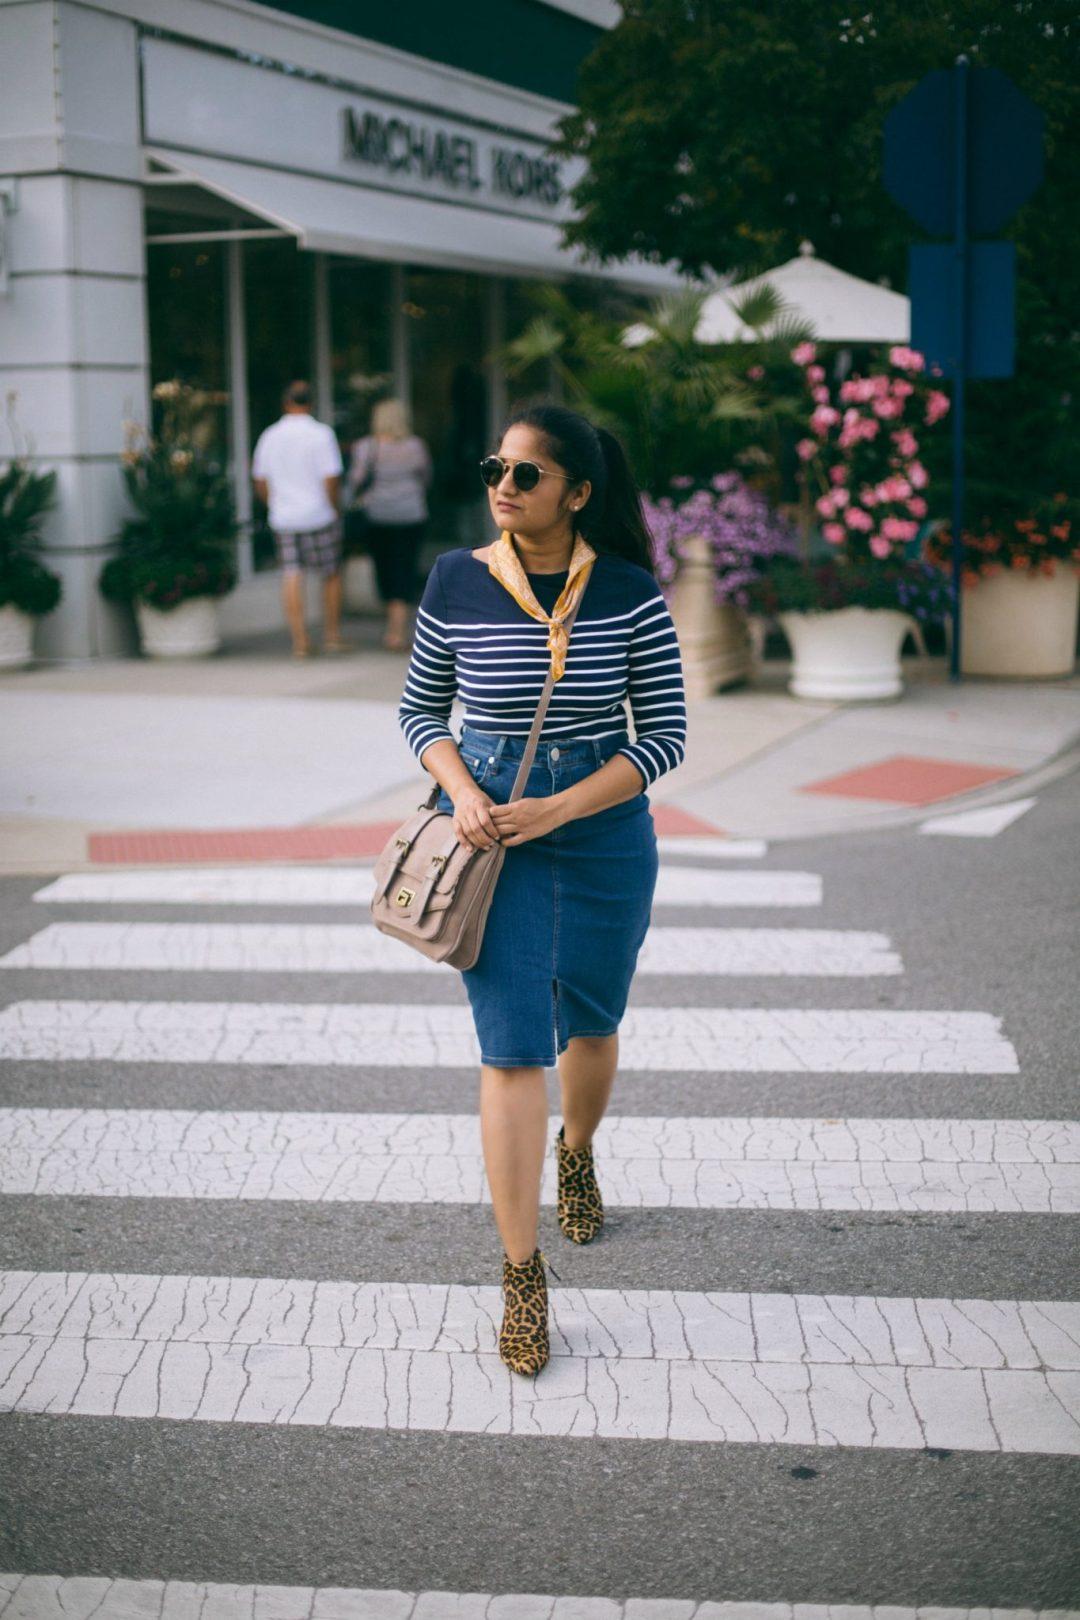 Lifestyle-blogger-Surekha-of-dreaming-loud-wearing-Banana-Republic-Seamed-Denim-Pencil-Skirt-2